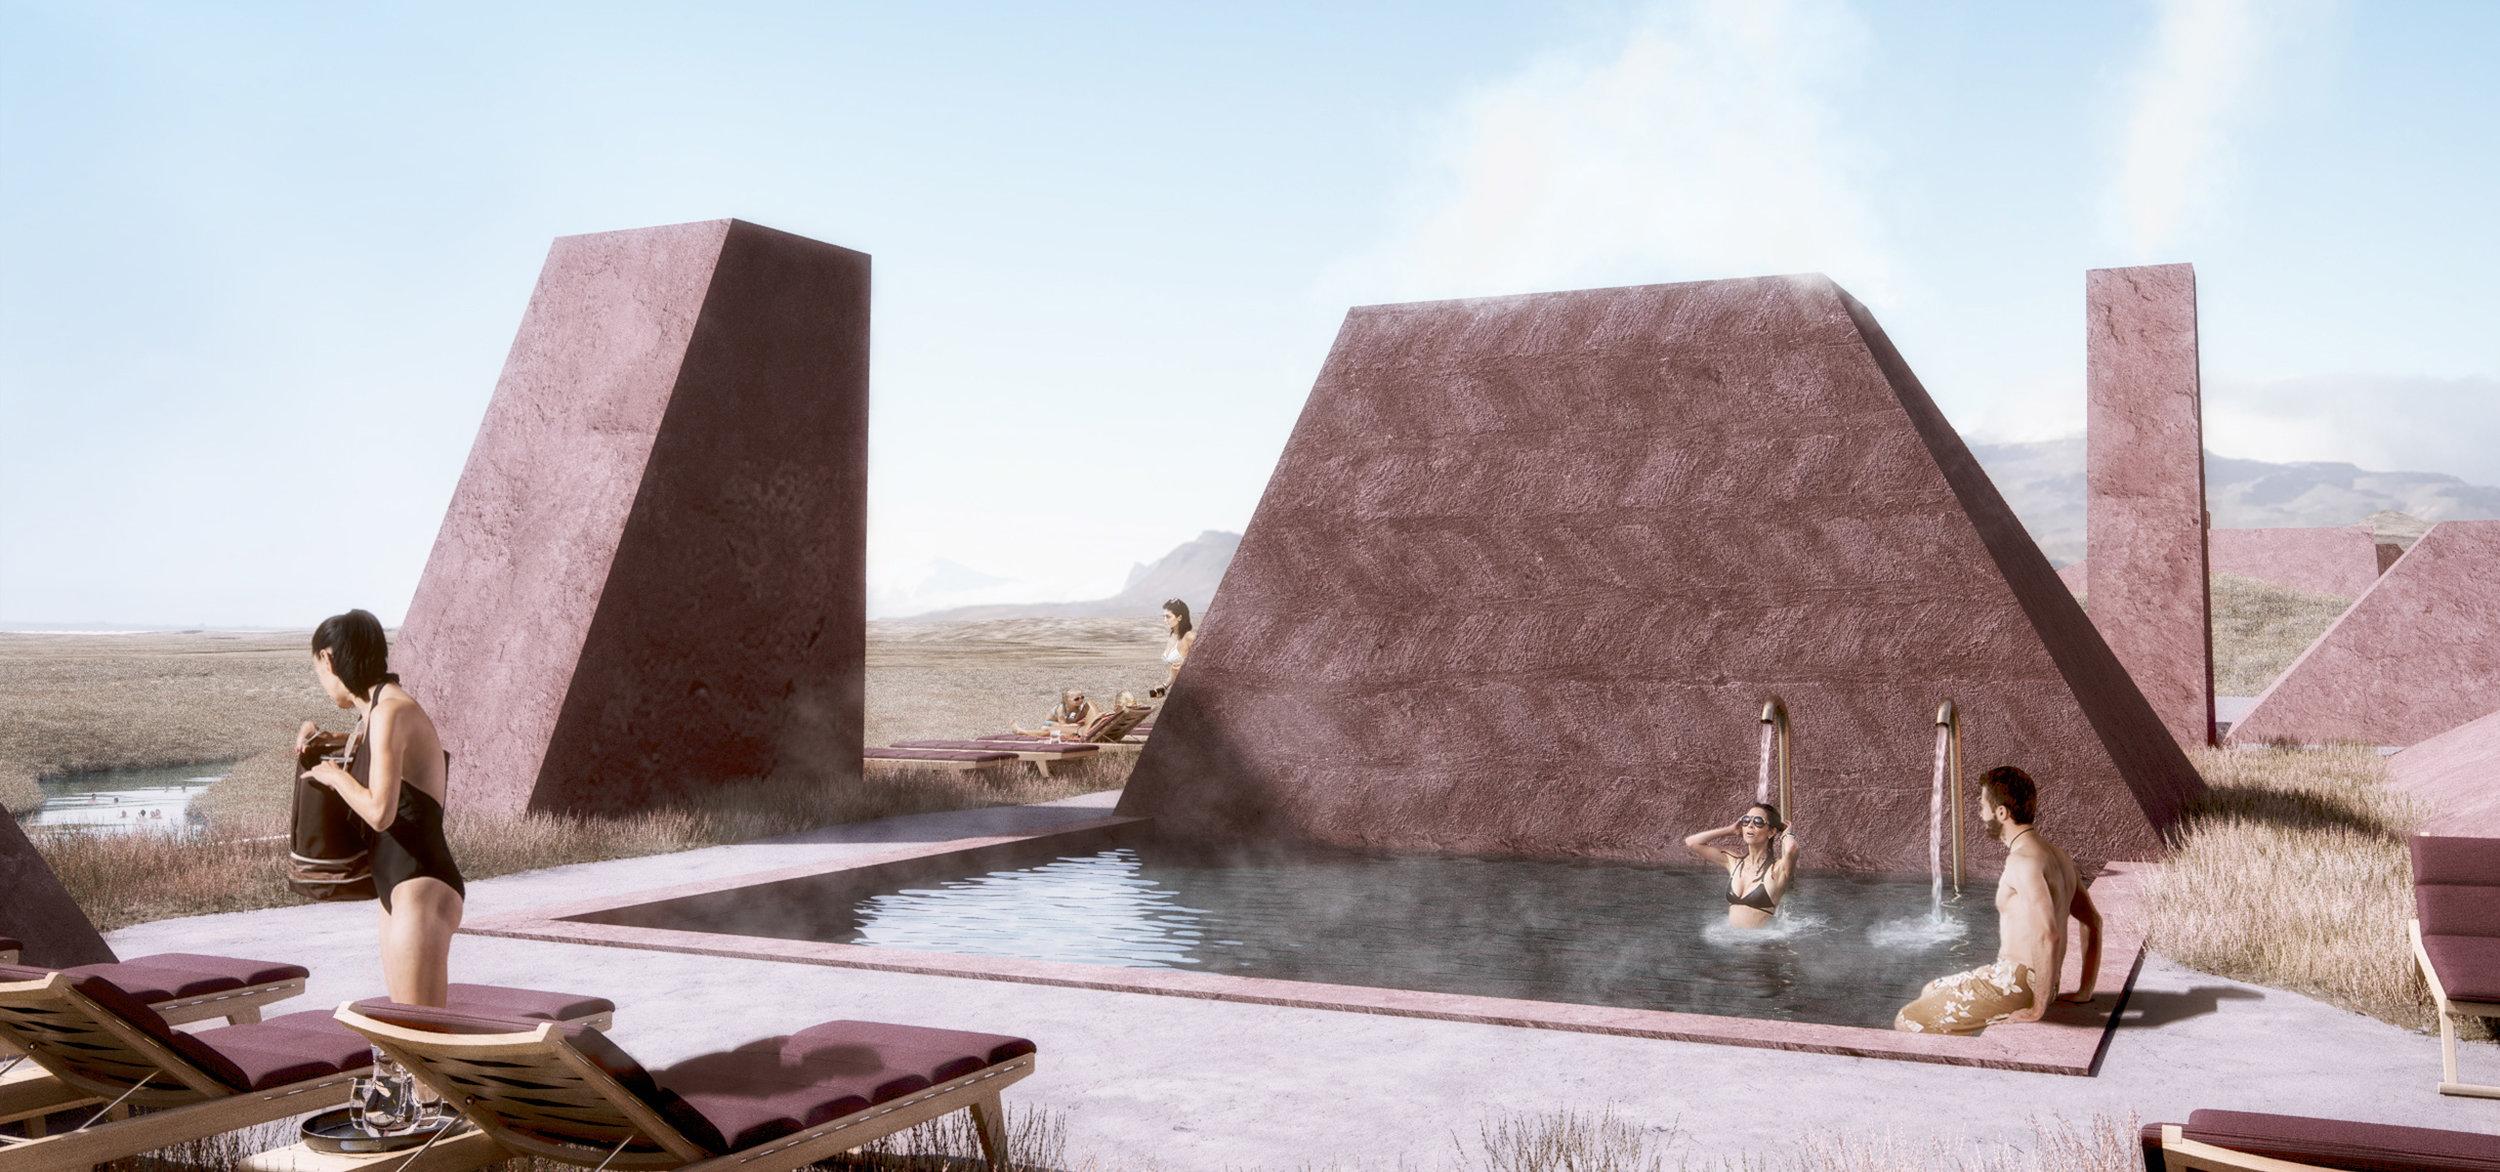 Spa Rooftop Pool - Steam Chimneys - Exterior Design